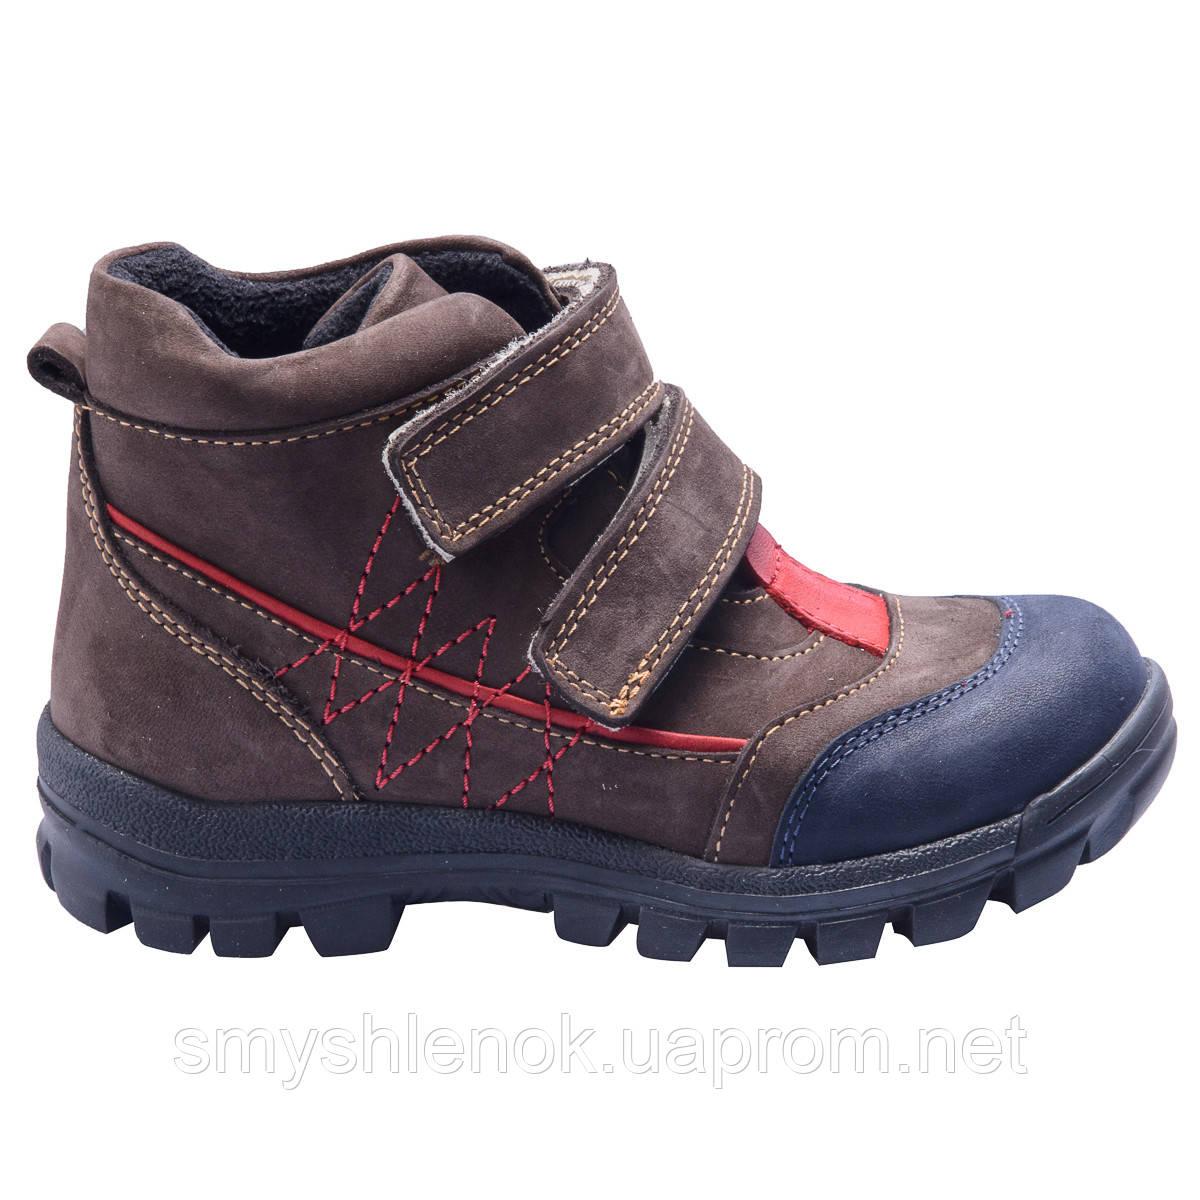 Ботинки Theo Leo RN605 21  см Синие,красно-коричневые